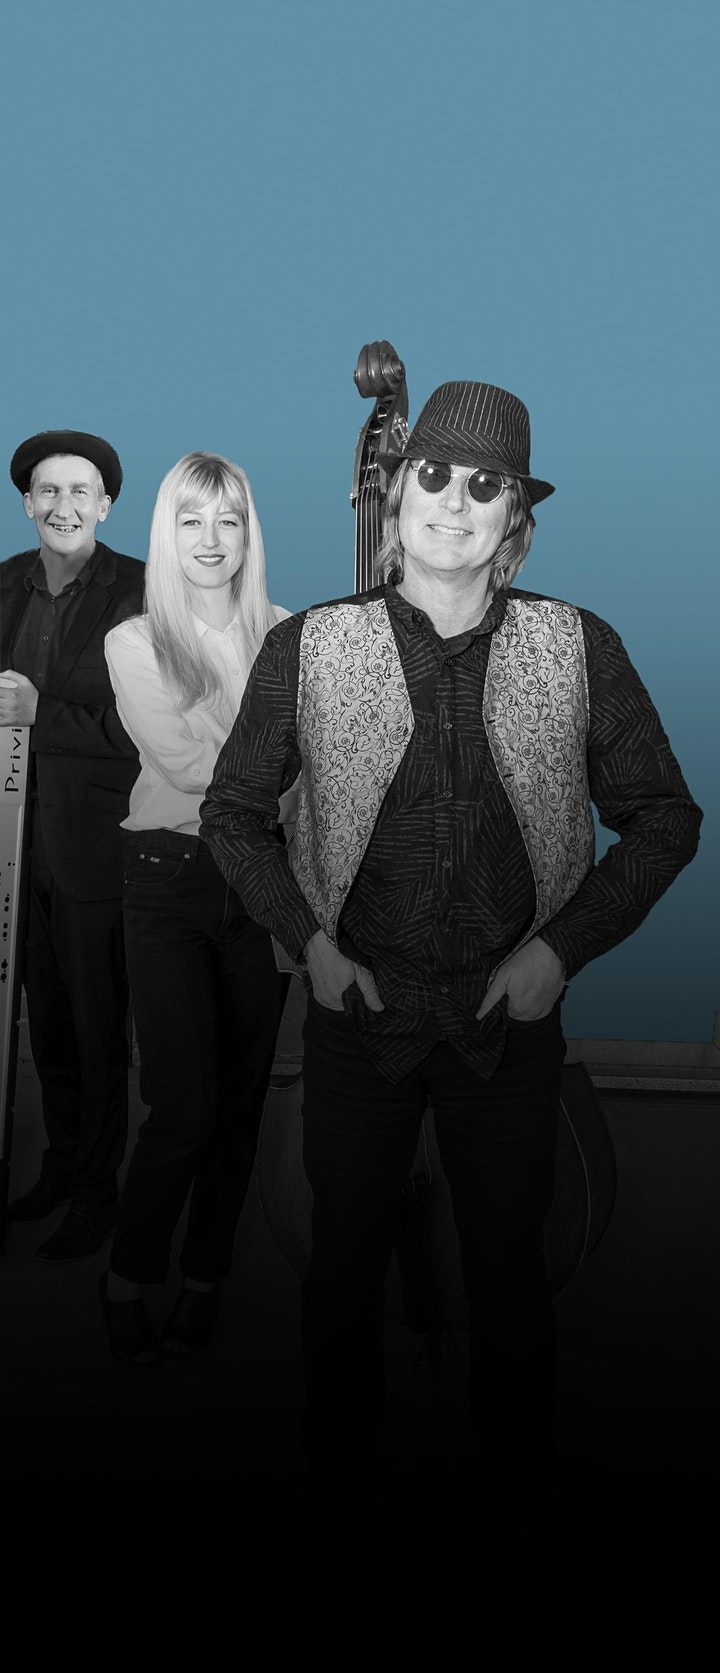 Dr Ian Champan and the Cosmic Jive Trio image